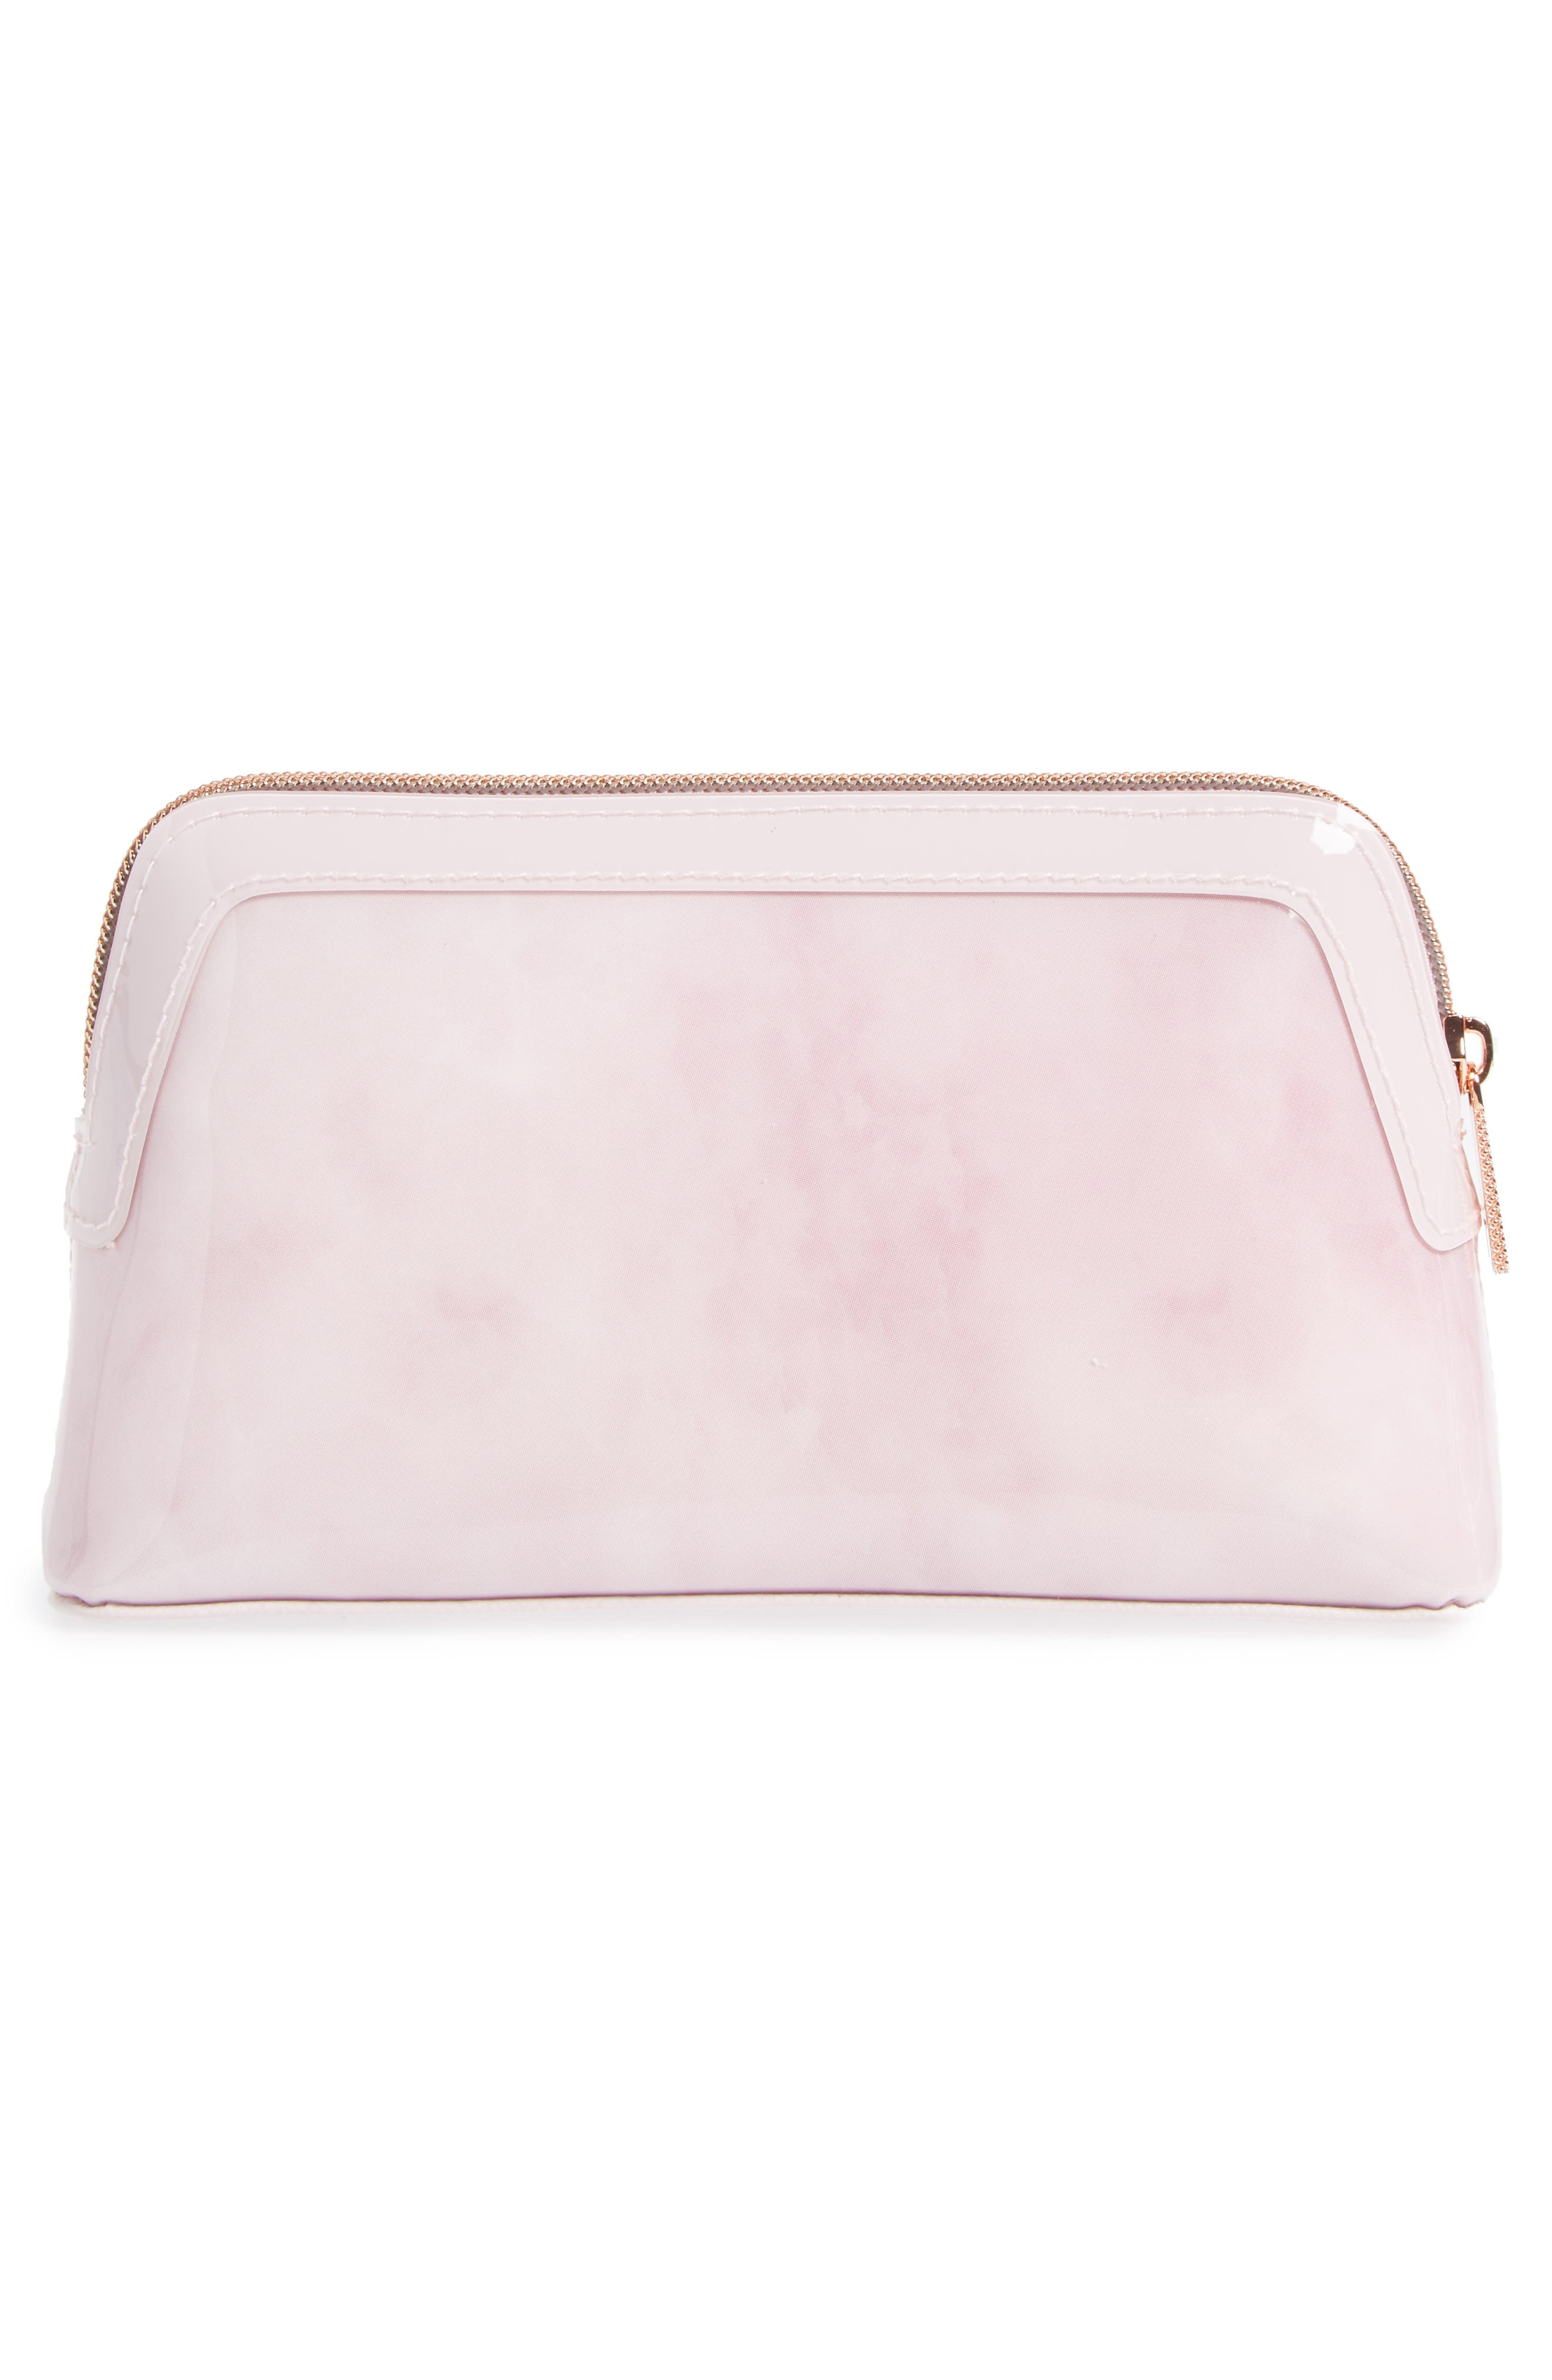 Zandra - Rose Quartz Cosmetics Bag,                             Alternate thumbnail 2, color,                             672